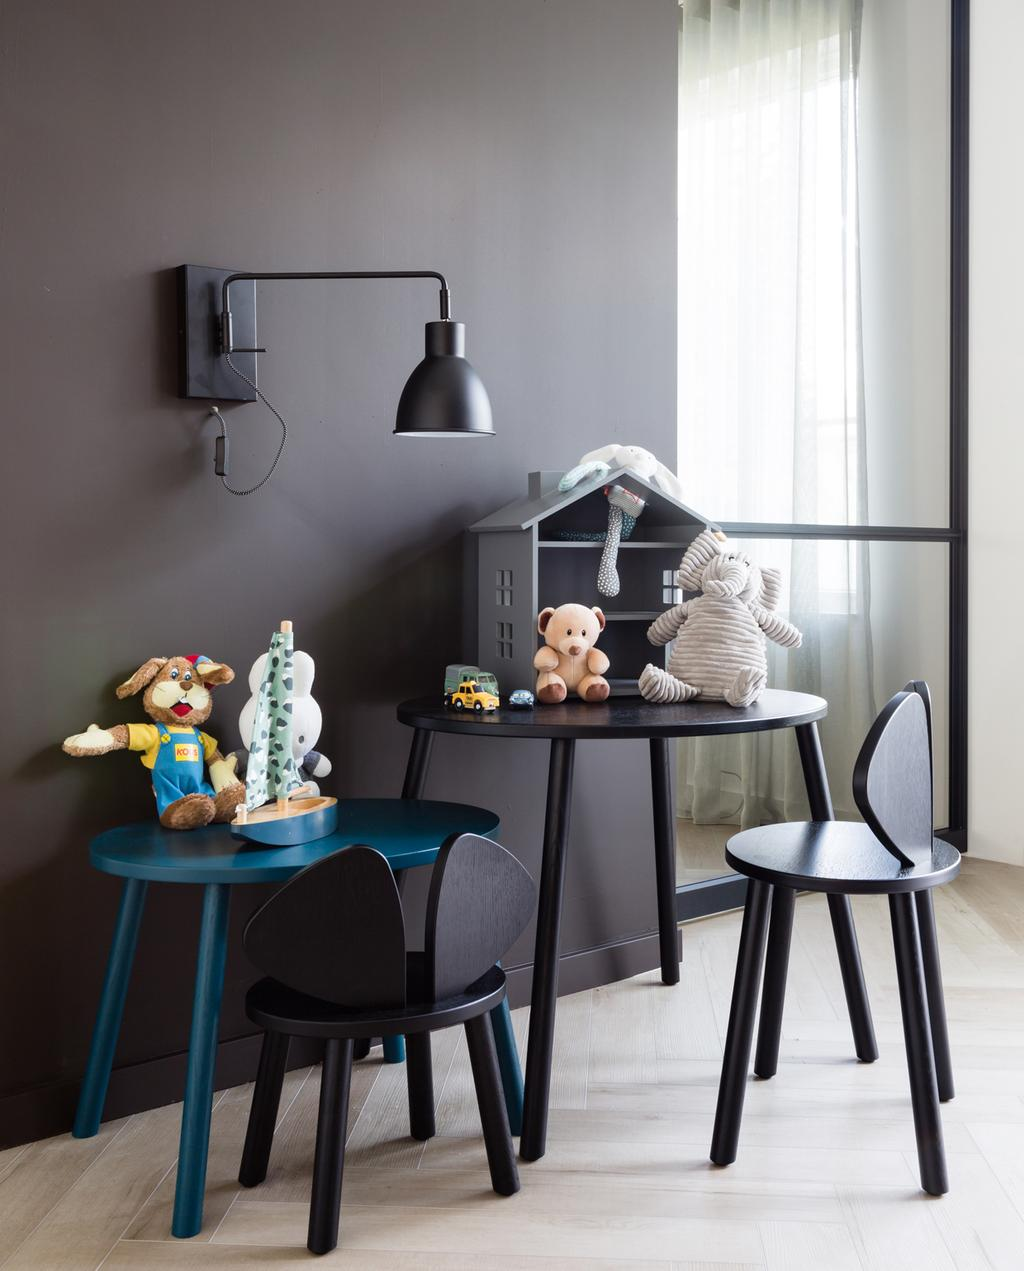 vtwonen weer verliefd op je huis | seizoen 11 aflevering 1 | Frans Uyterlinde in Lelystad